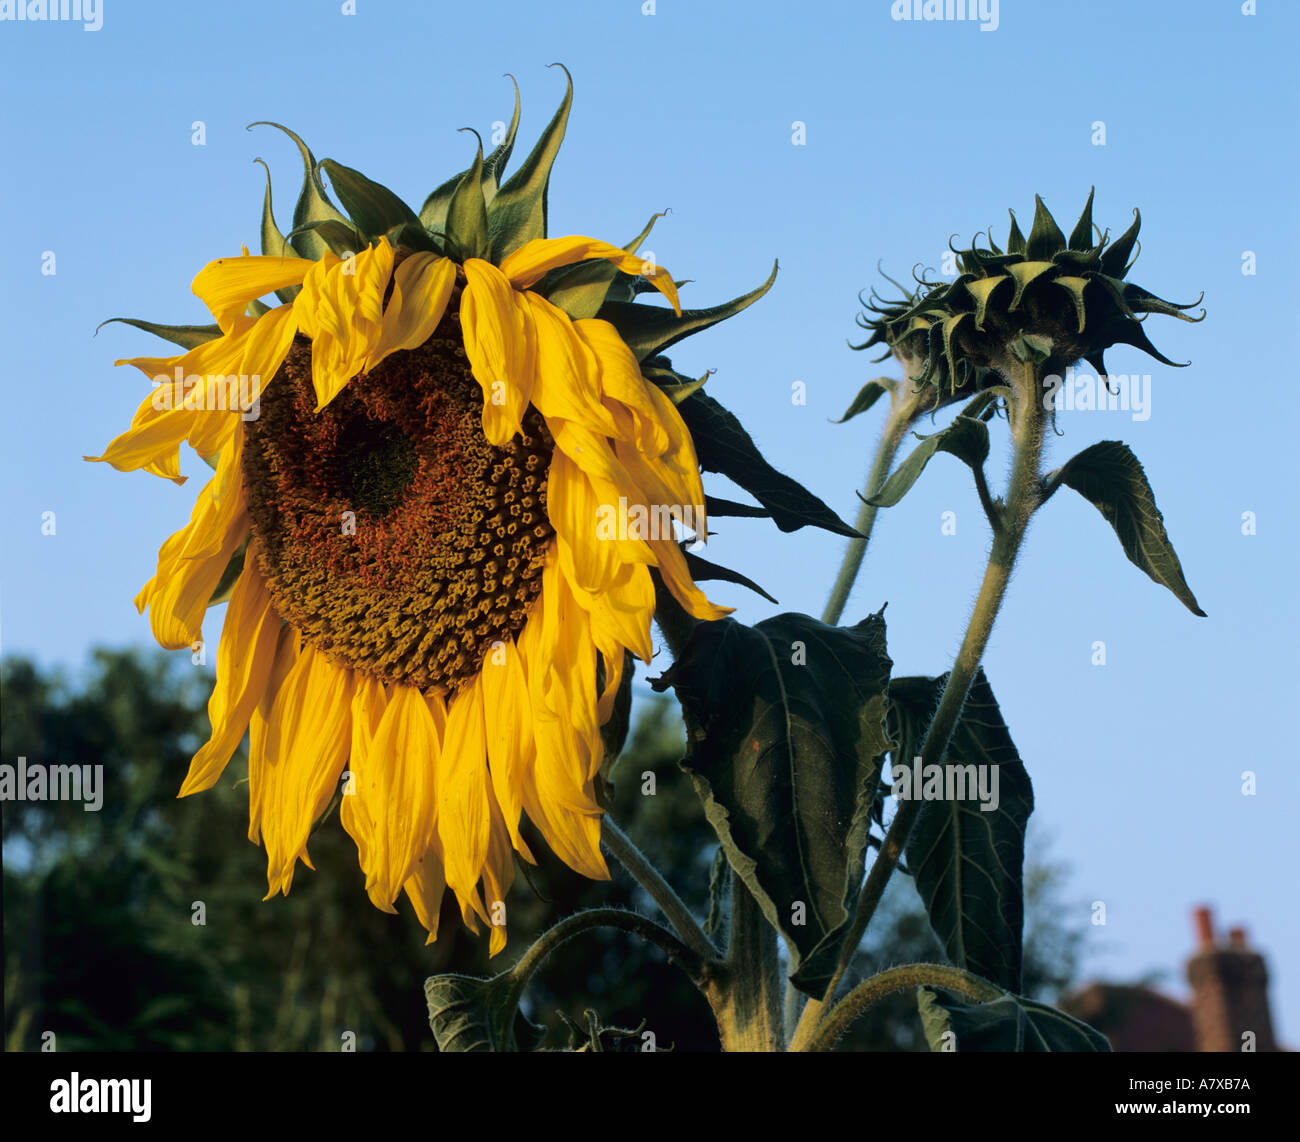 Dead Sun Flower Head Drooping Down Against A Blue Sky